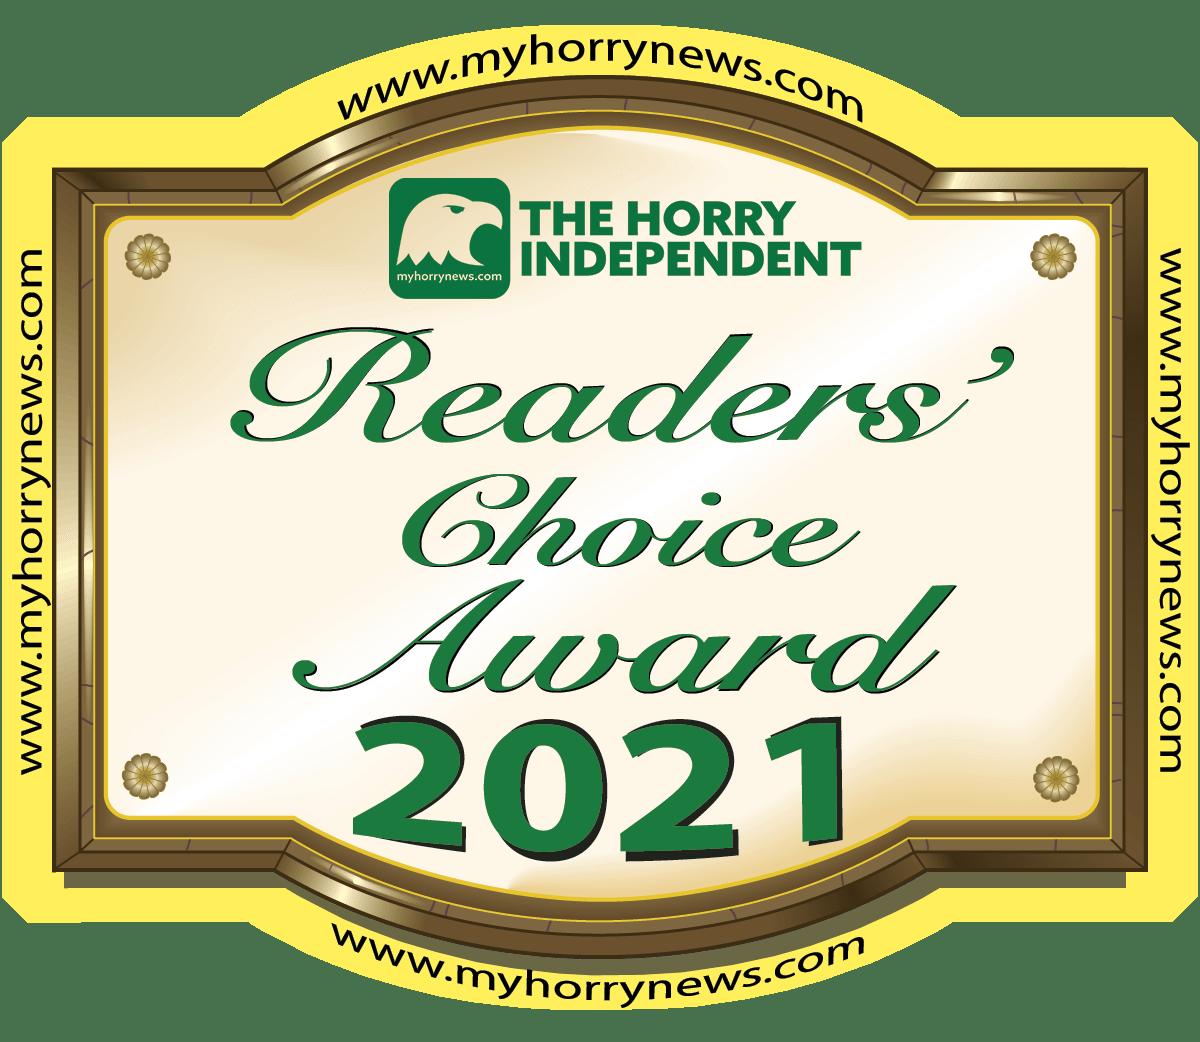 2021 HI Readers' Choice